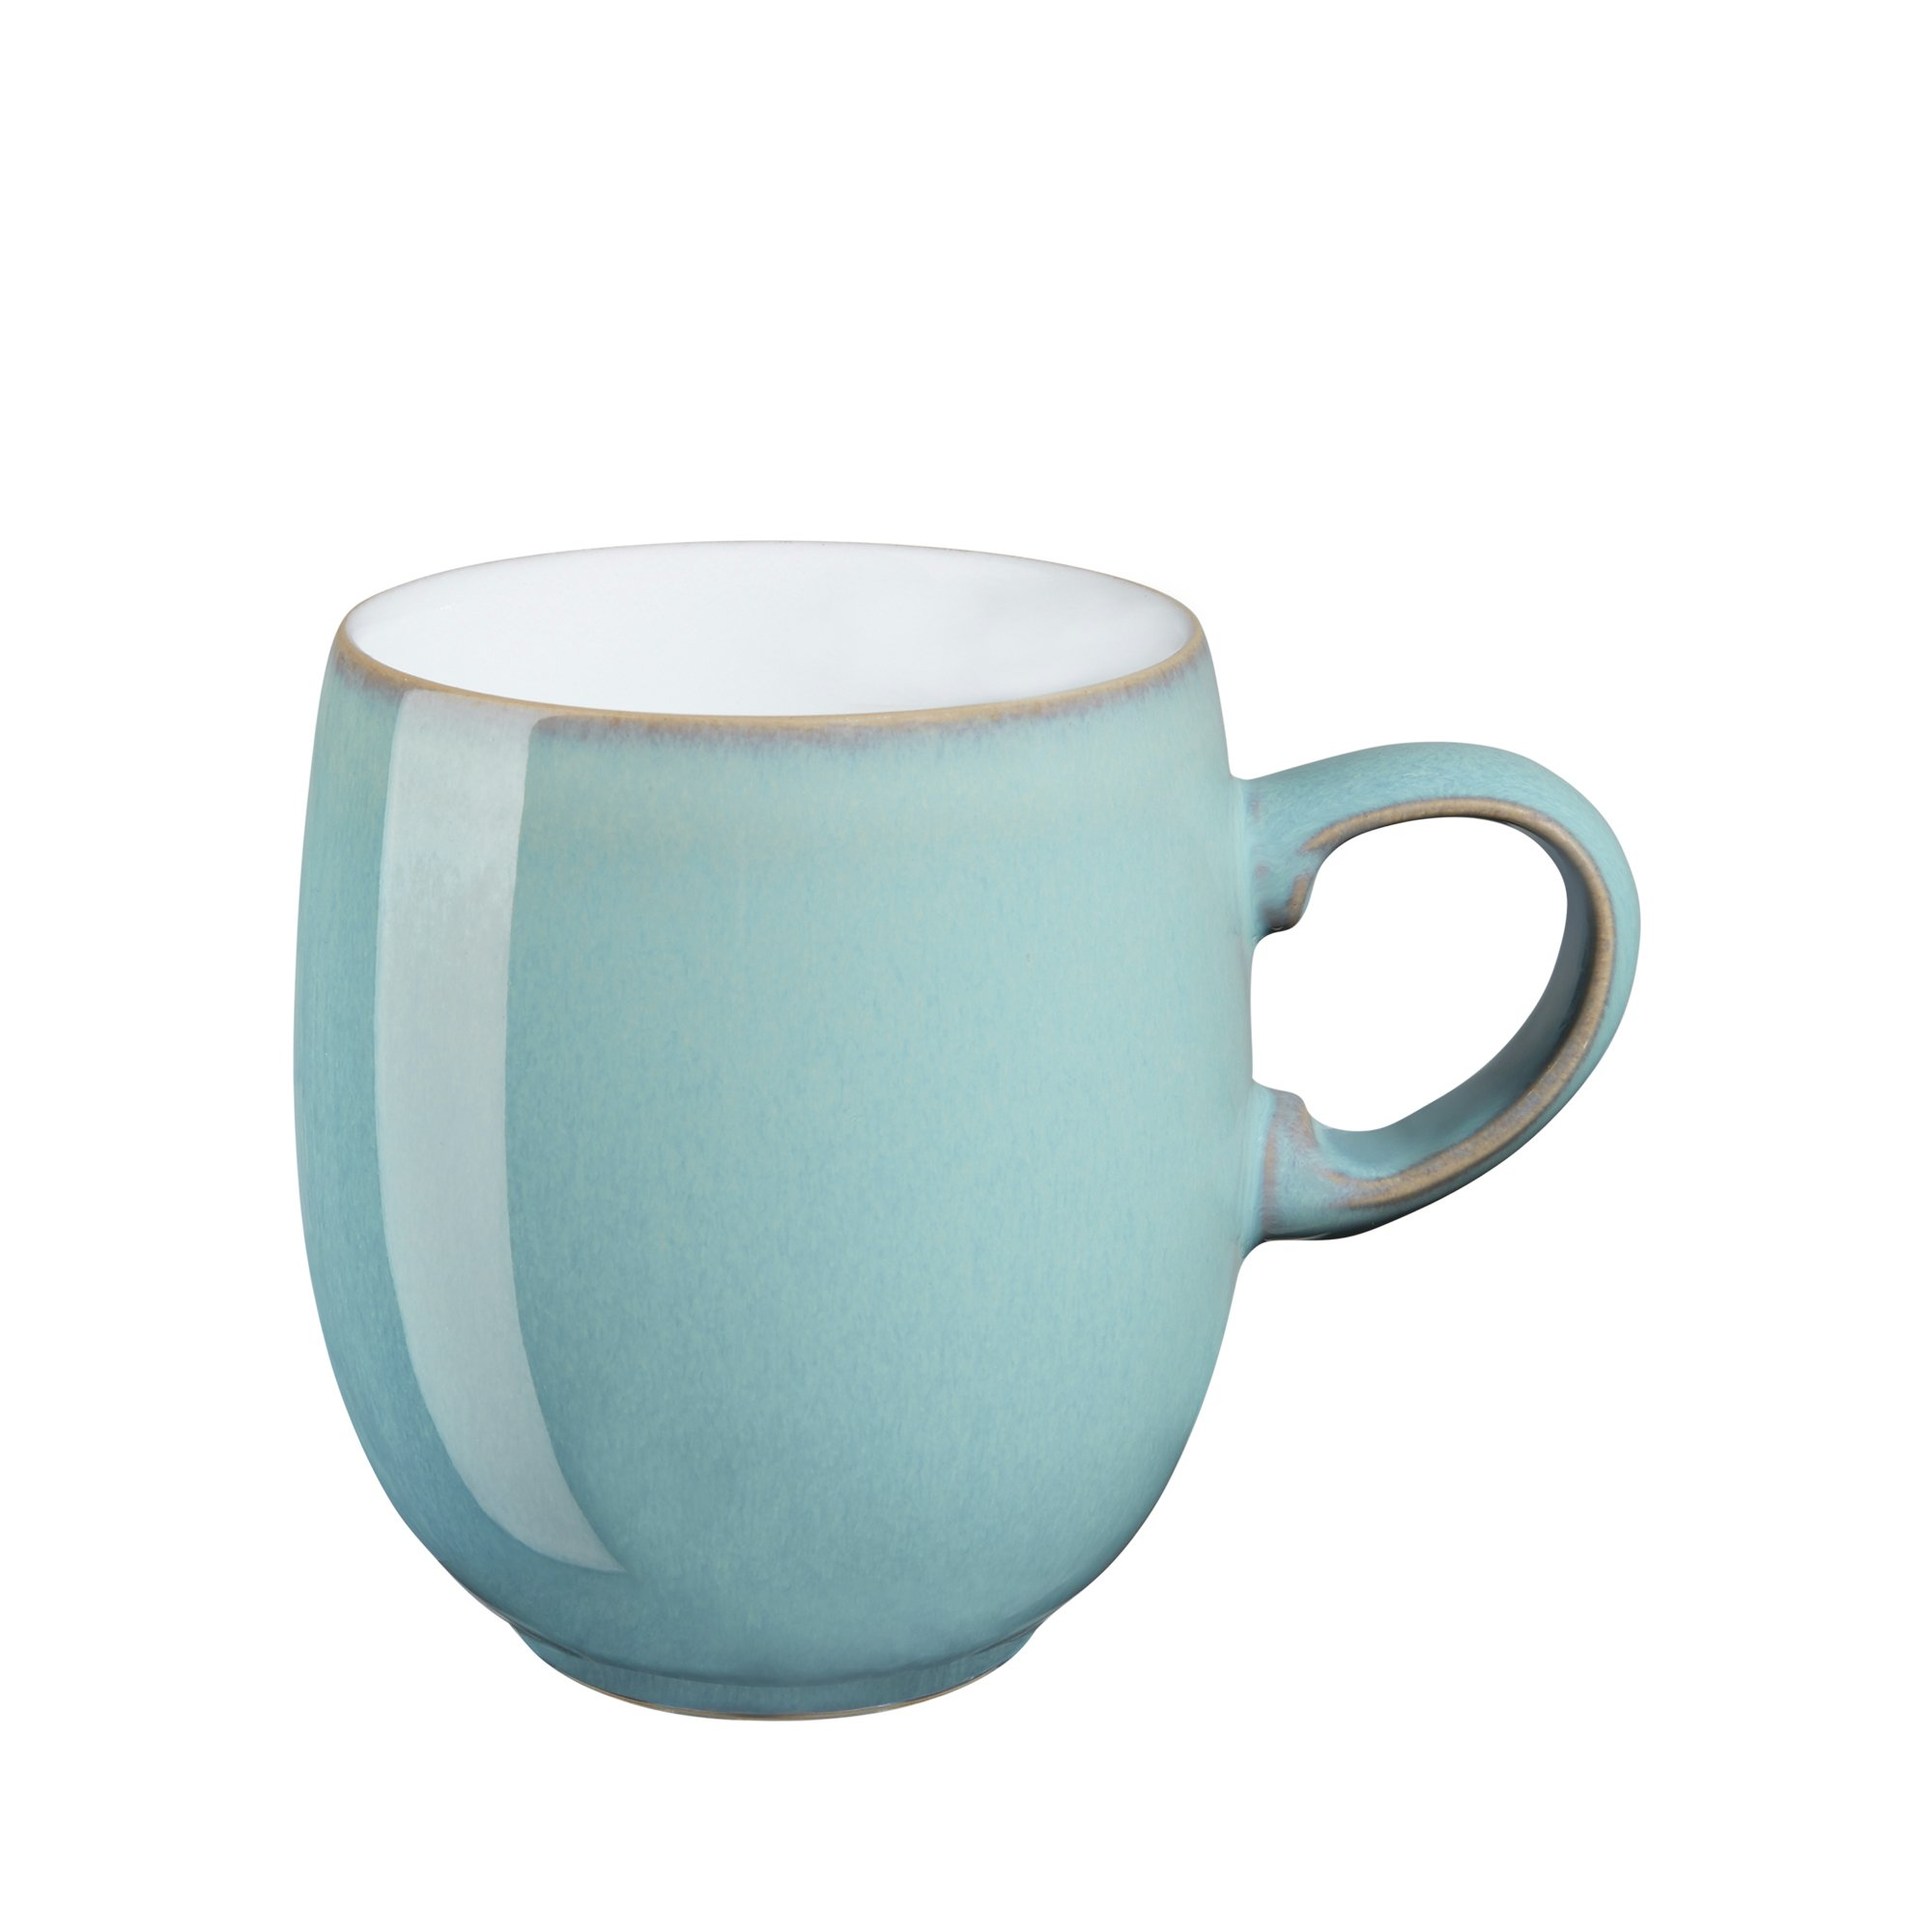 Denby Azure Large Curve Mugs, Set of 4